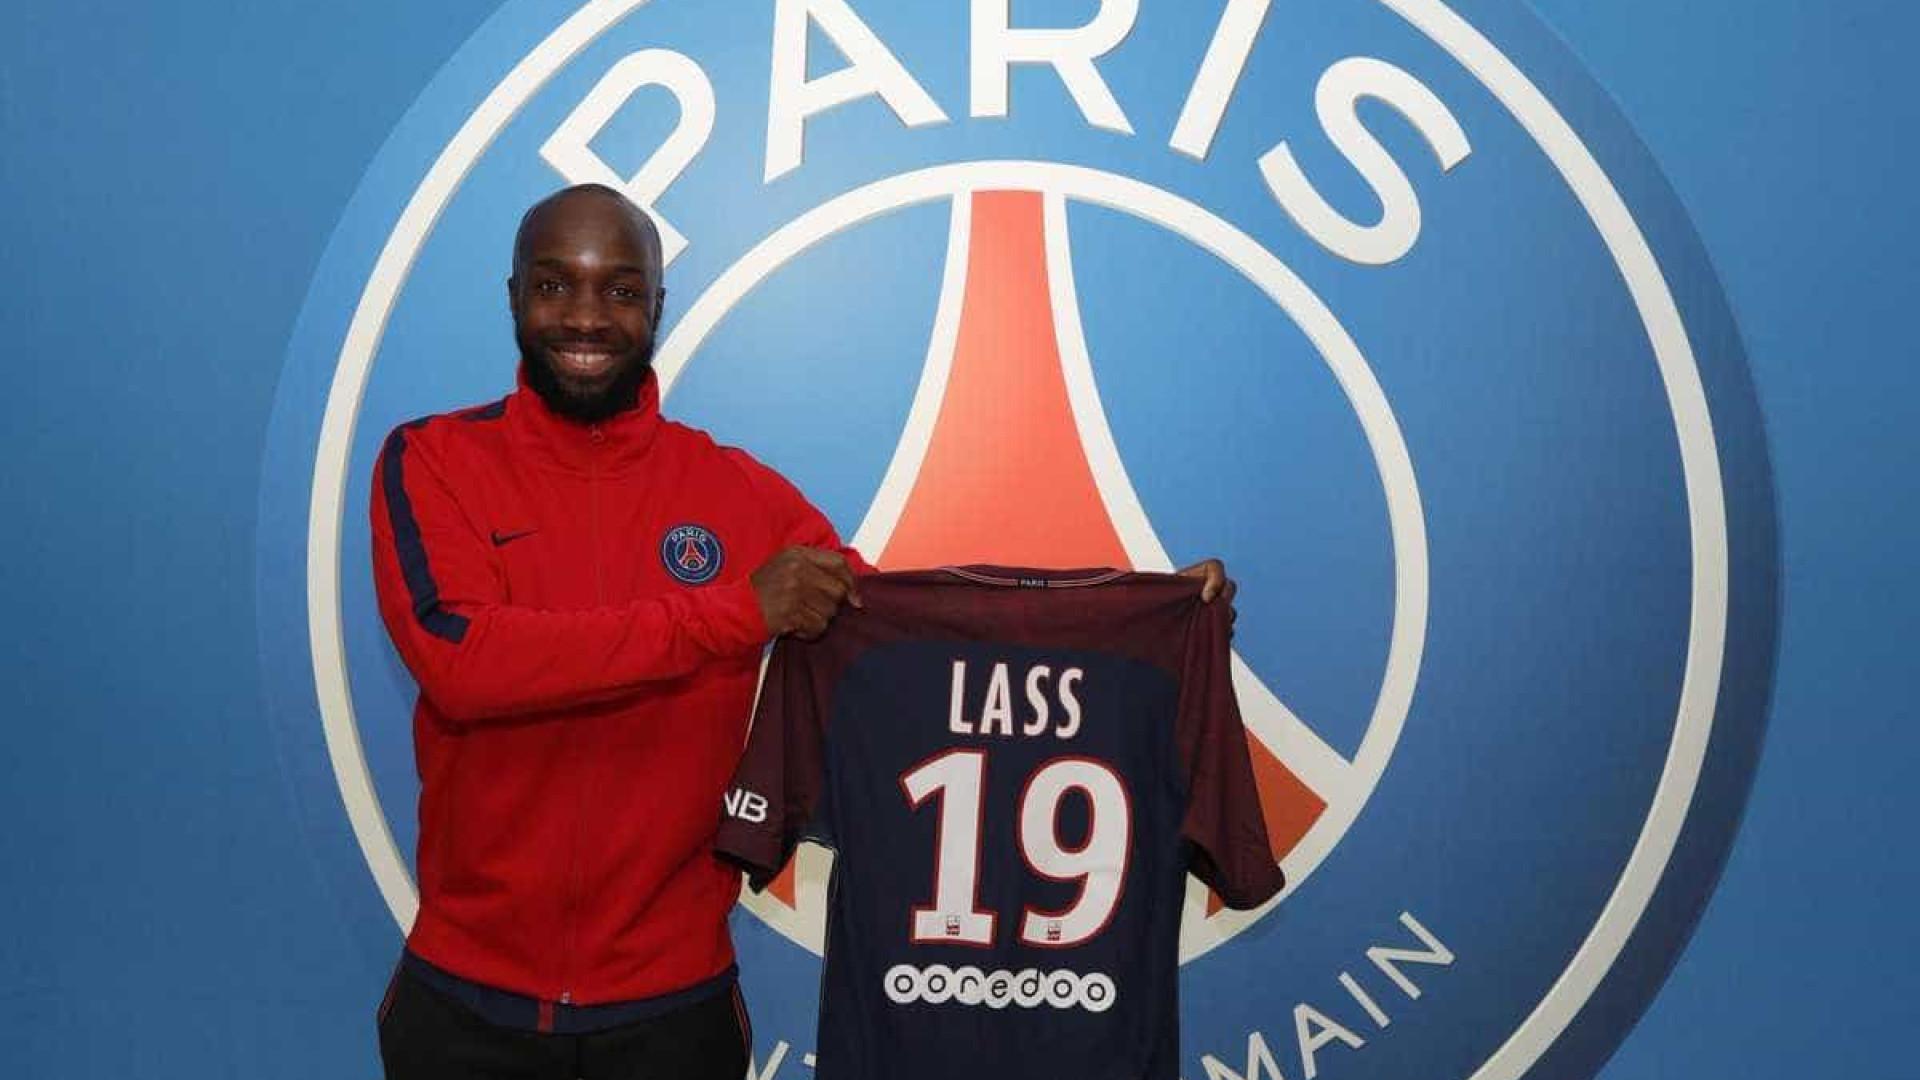 Diarra passa por exames médicos antes de assinar o contrato no PSG